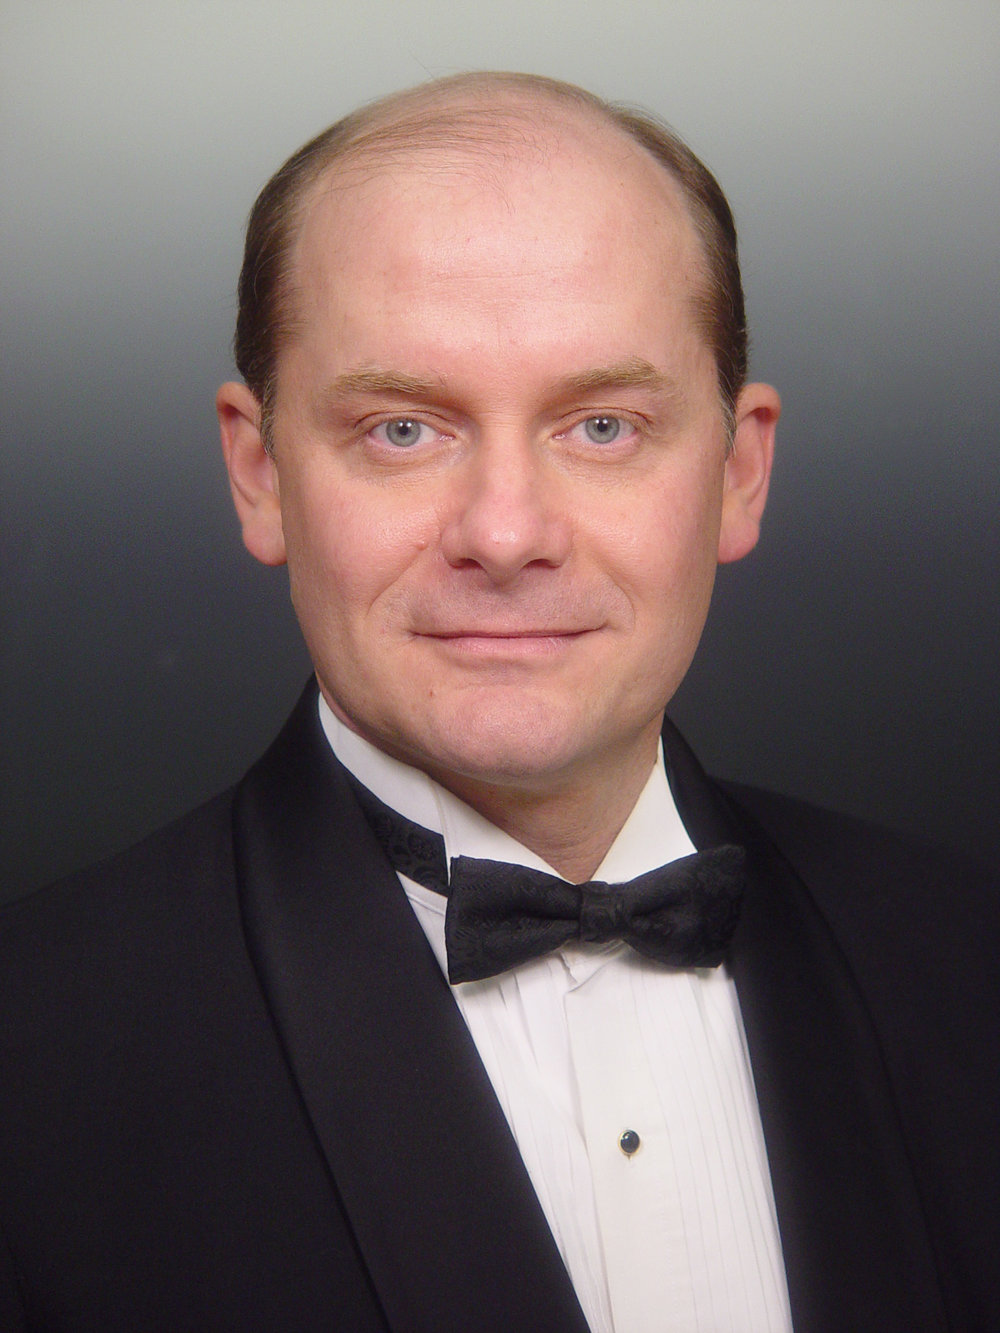 Joe Wiggett, baritone